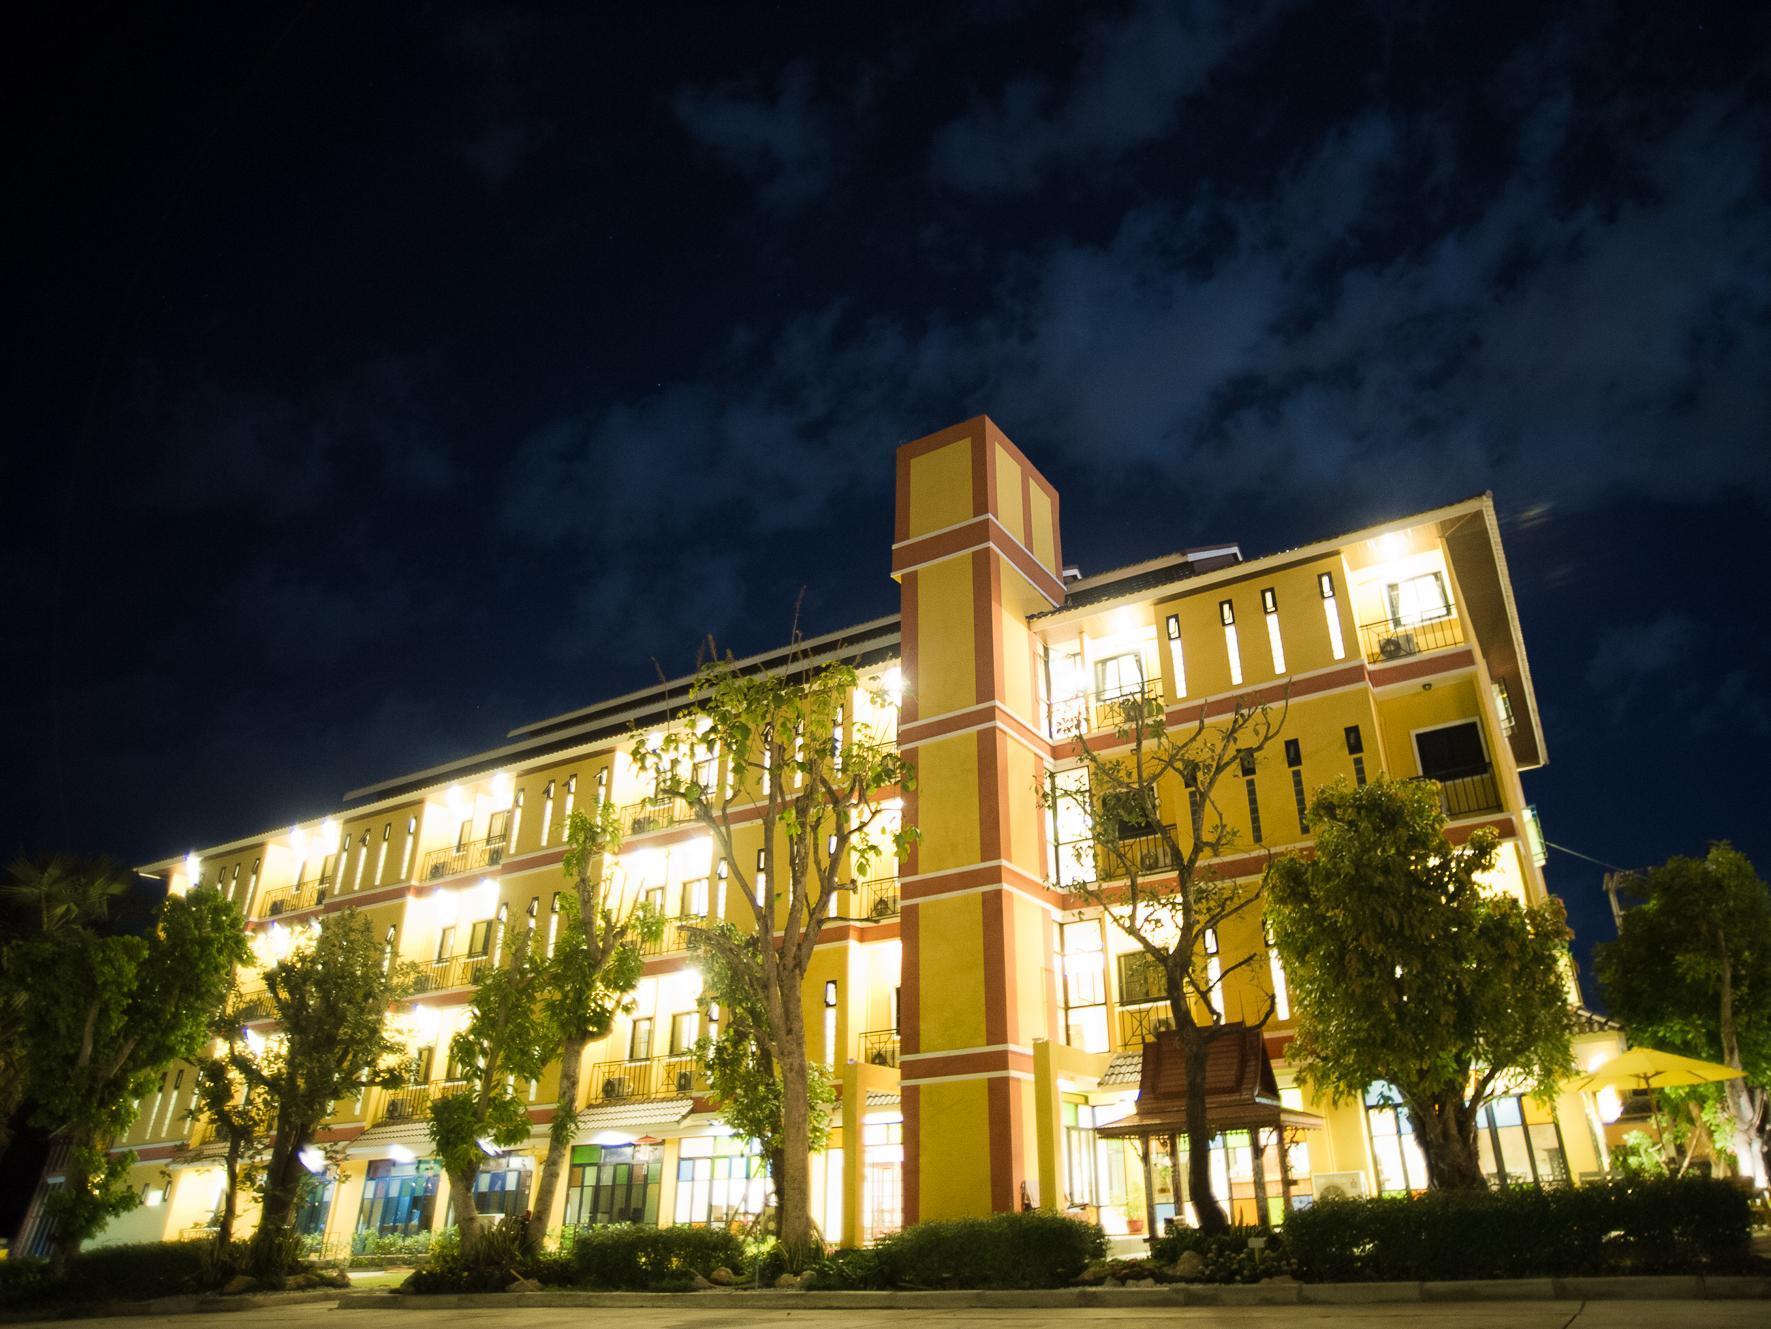 Boonme Heritage Hotel,โรงแรมบุญมี เฮอริเทจ